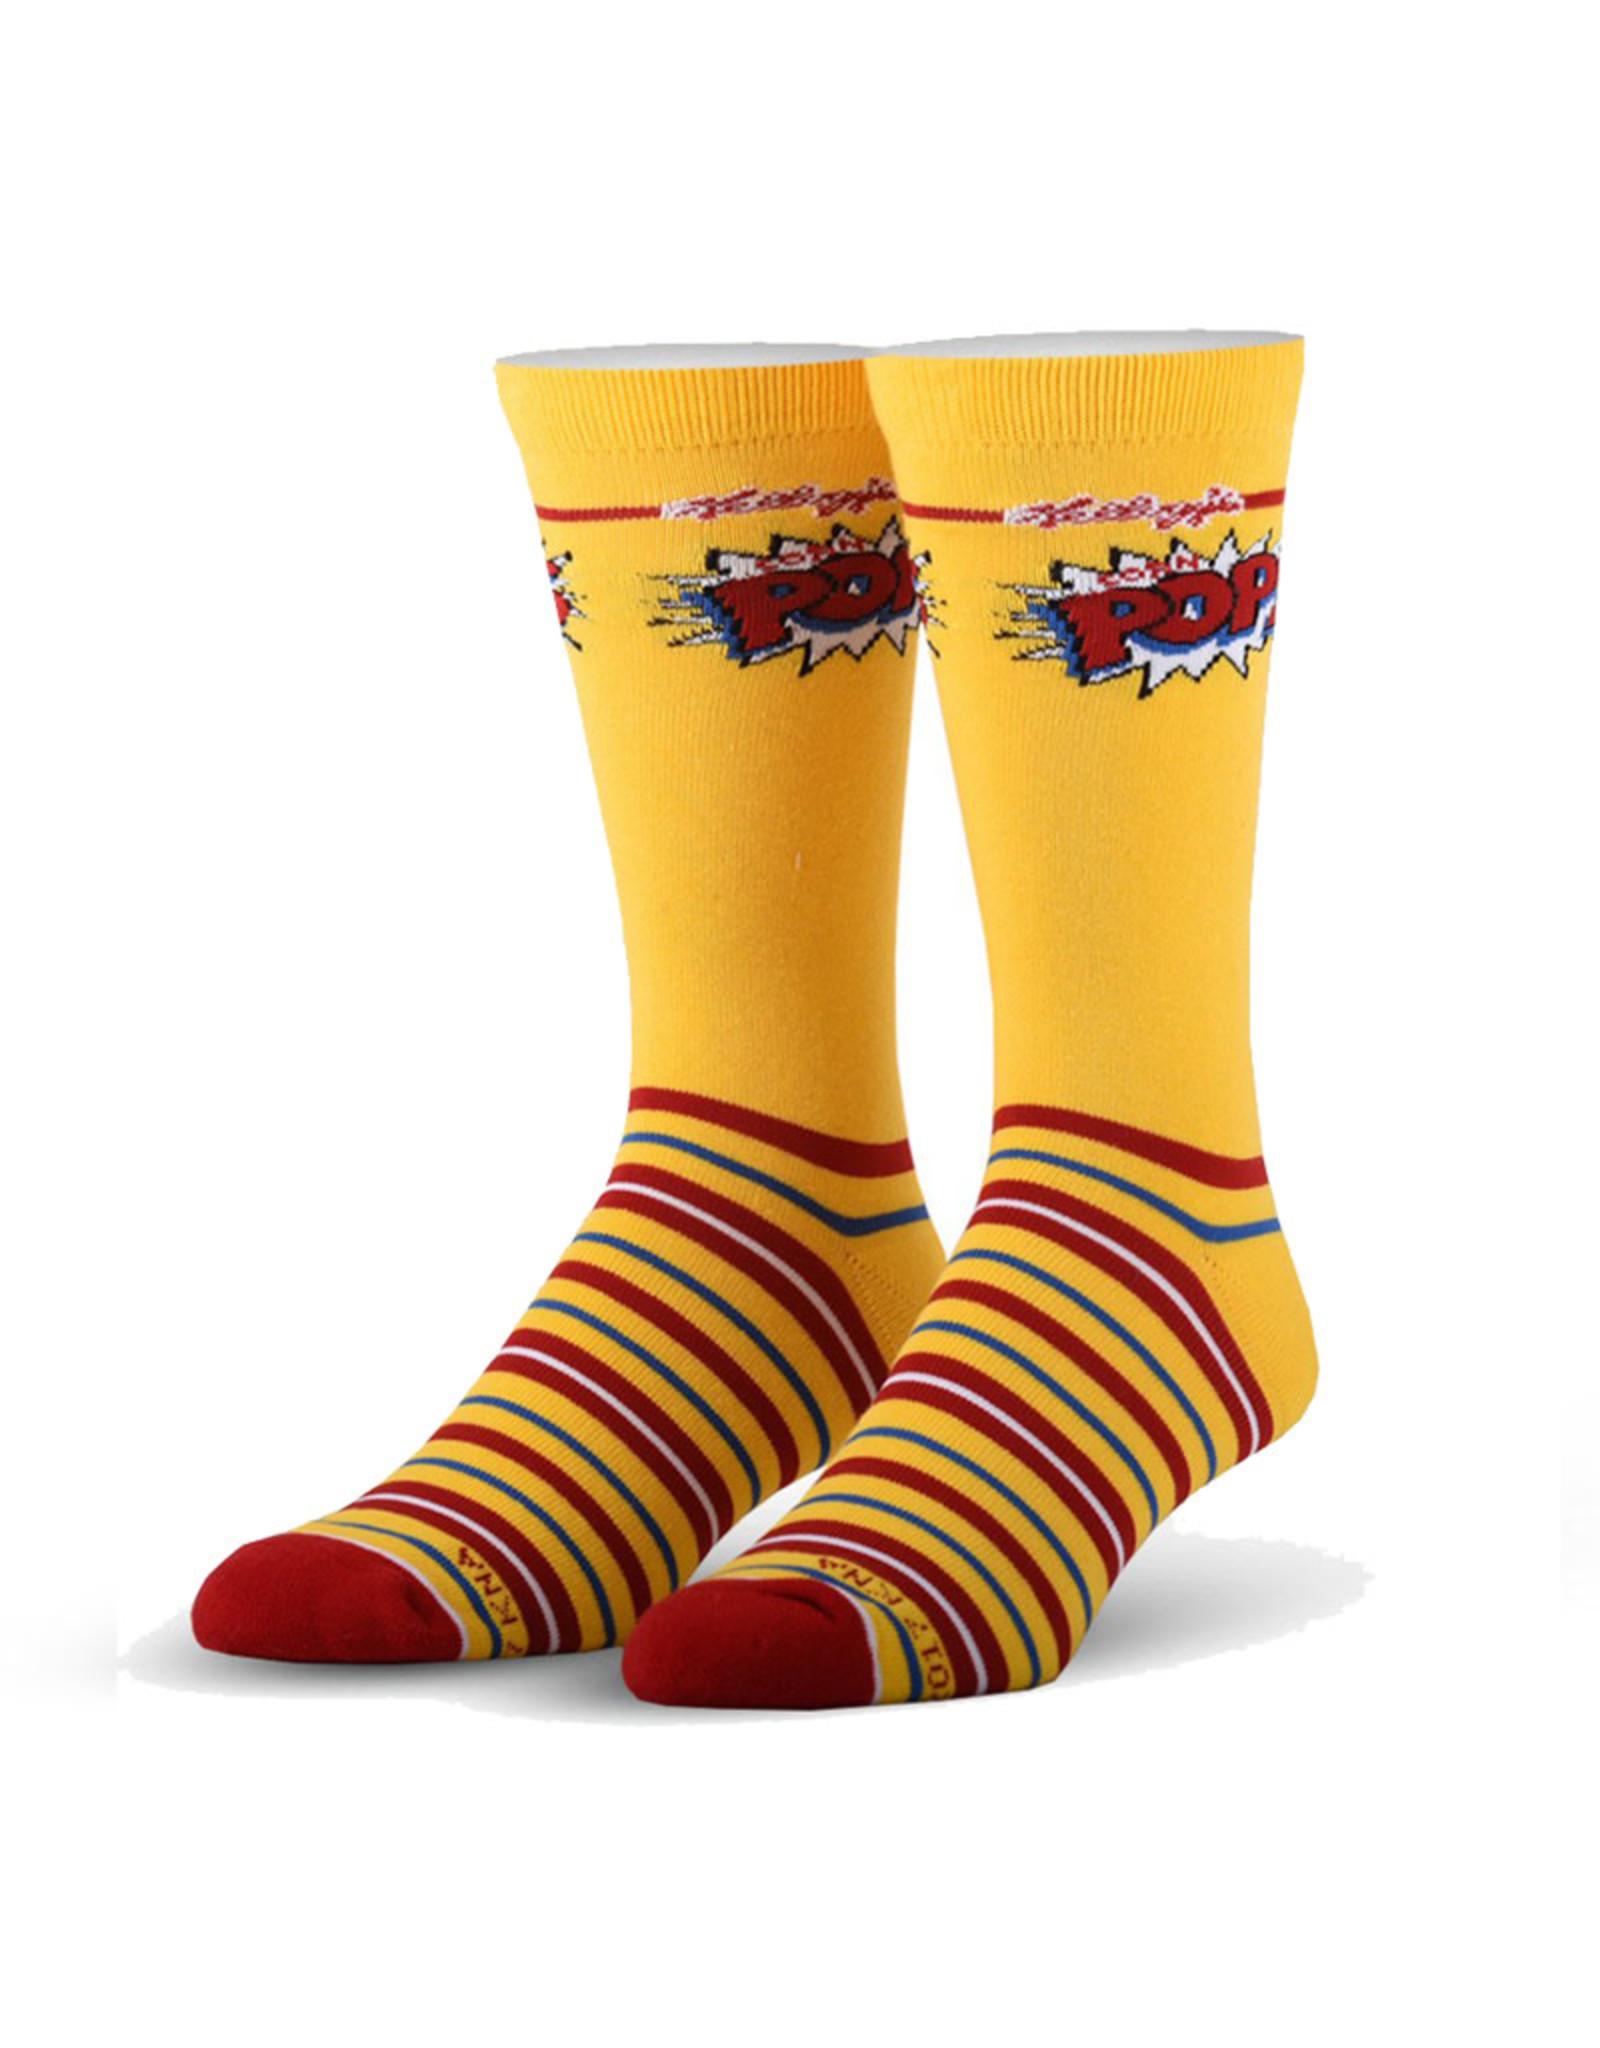 Kellogg's ( Cool Socks Sock ) Corn  Pops